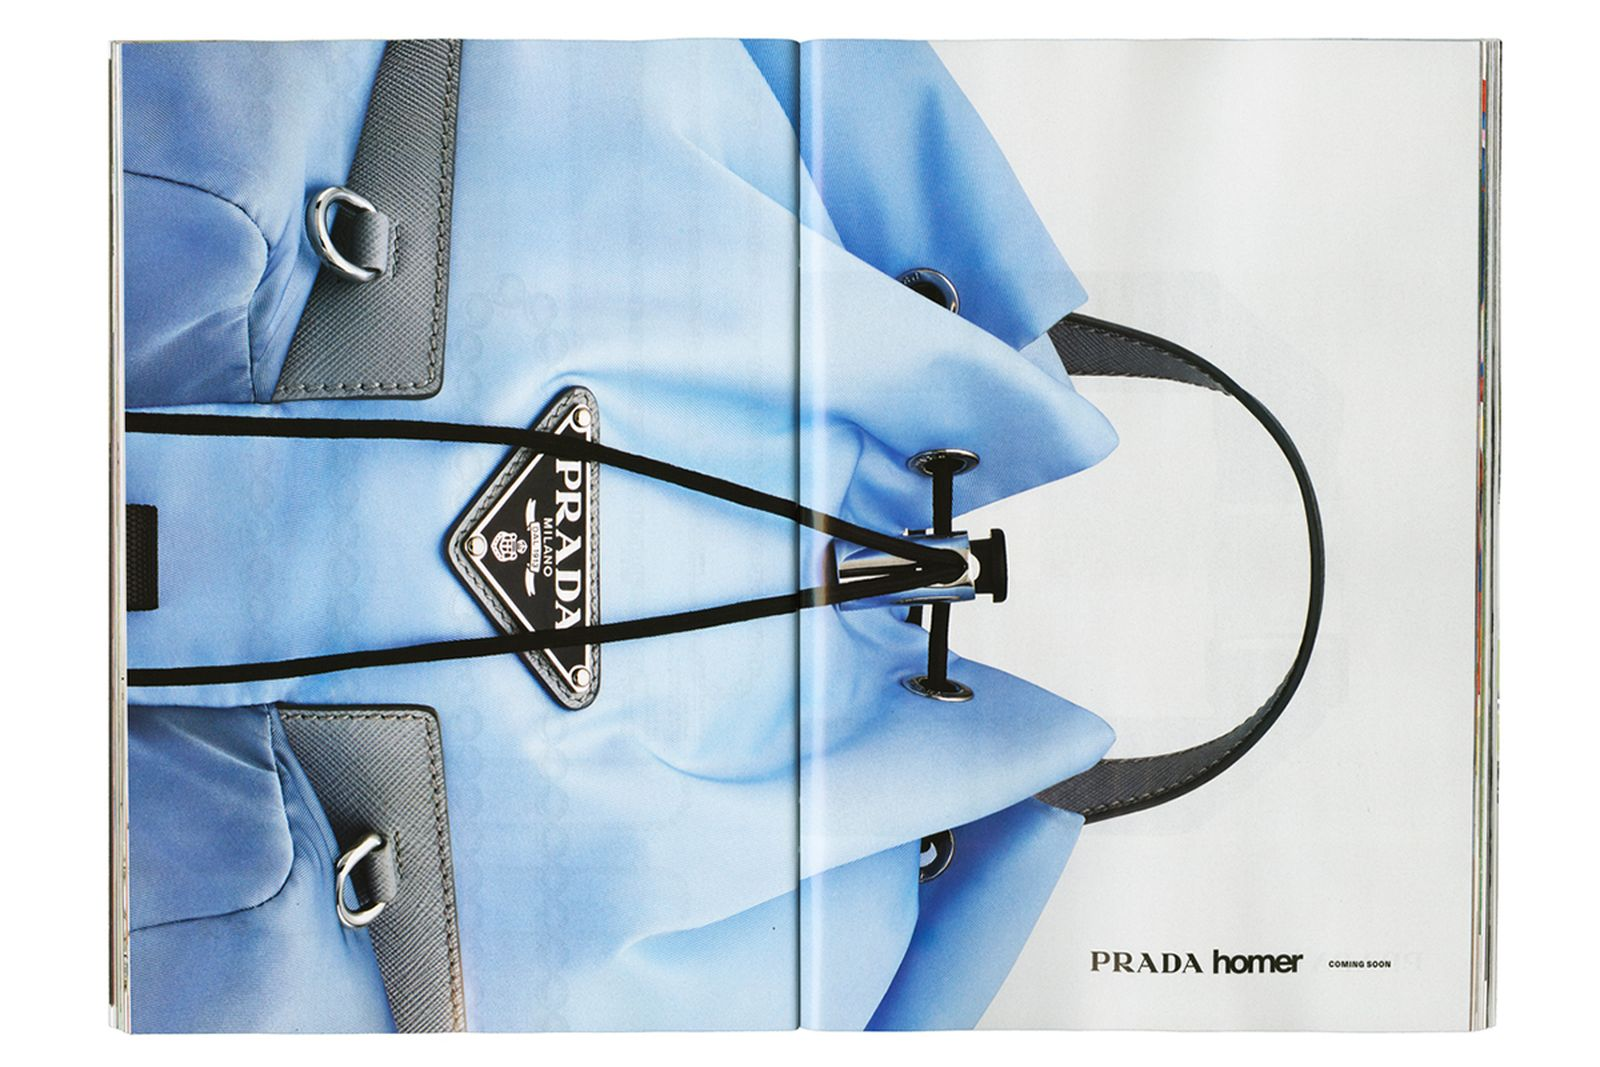 Frank Ocean Homer Brand prada collabstore Catalog bagcollection jewelry silk scarves